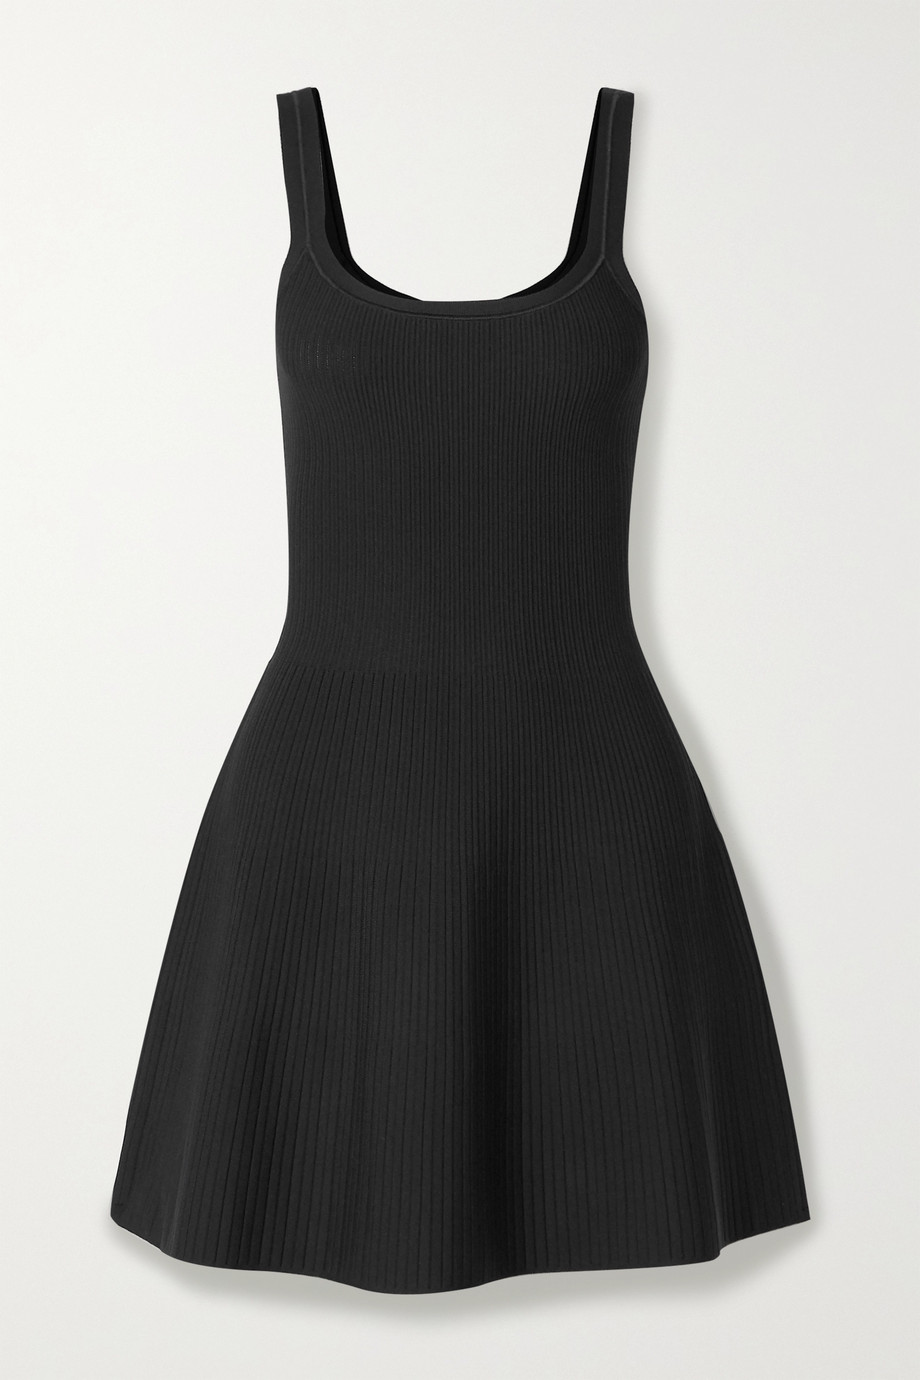 Theory Ribbed stretch-knit mini dress